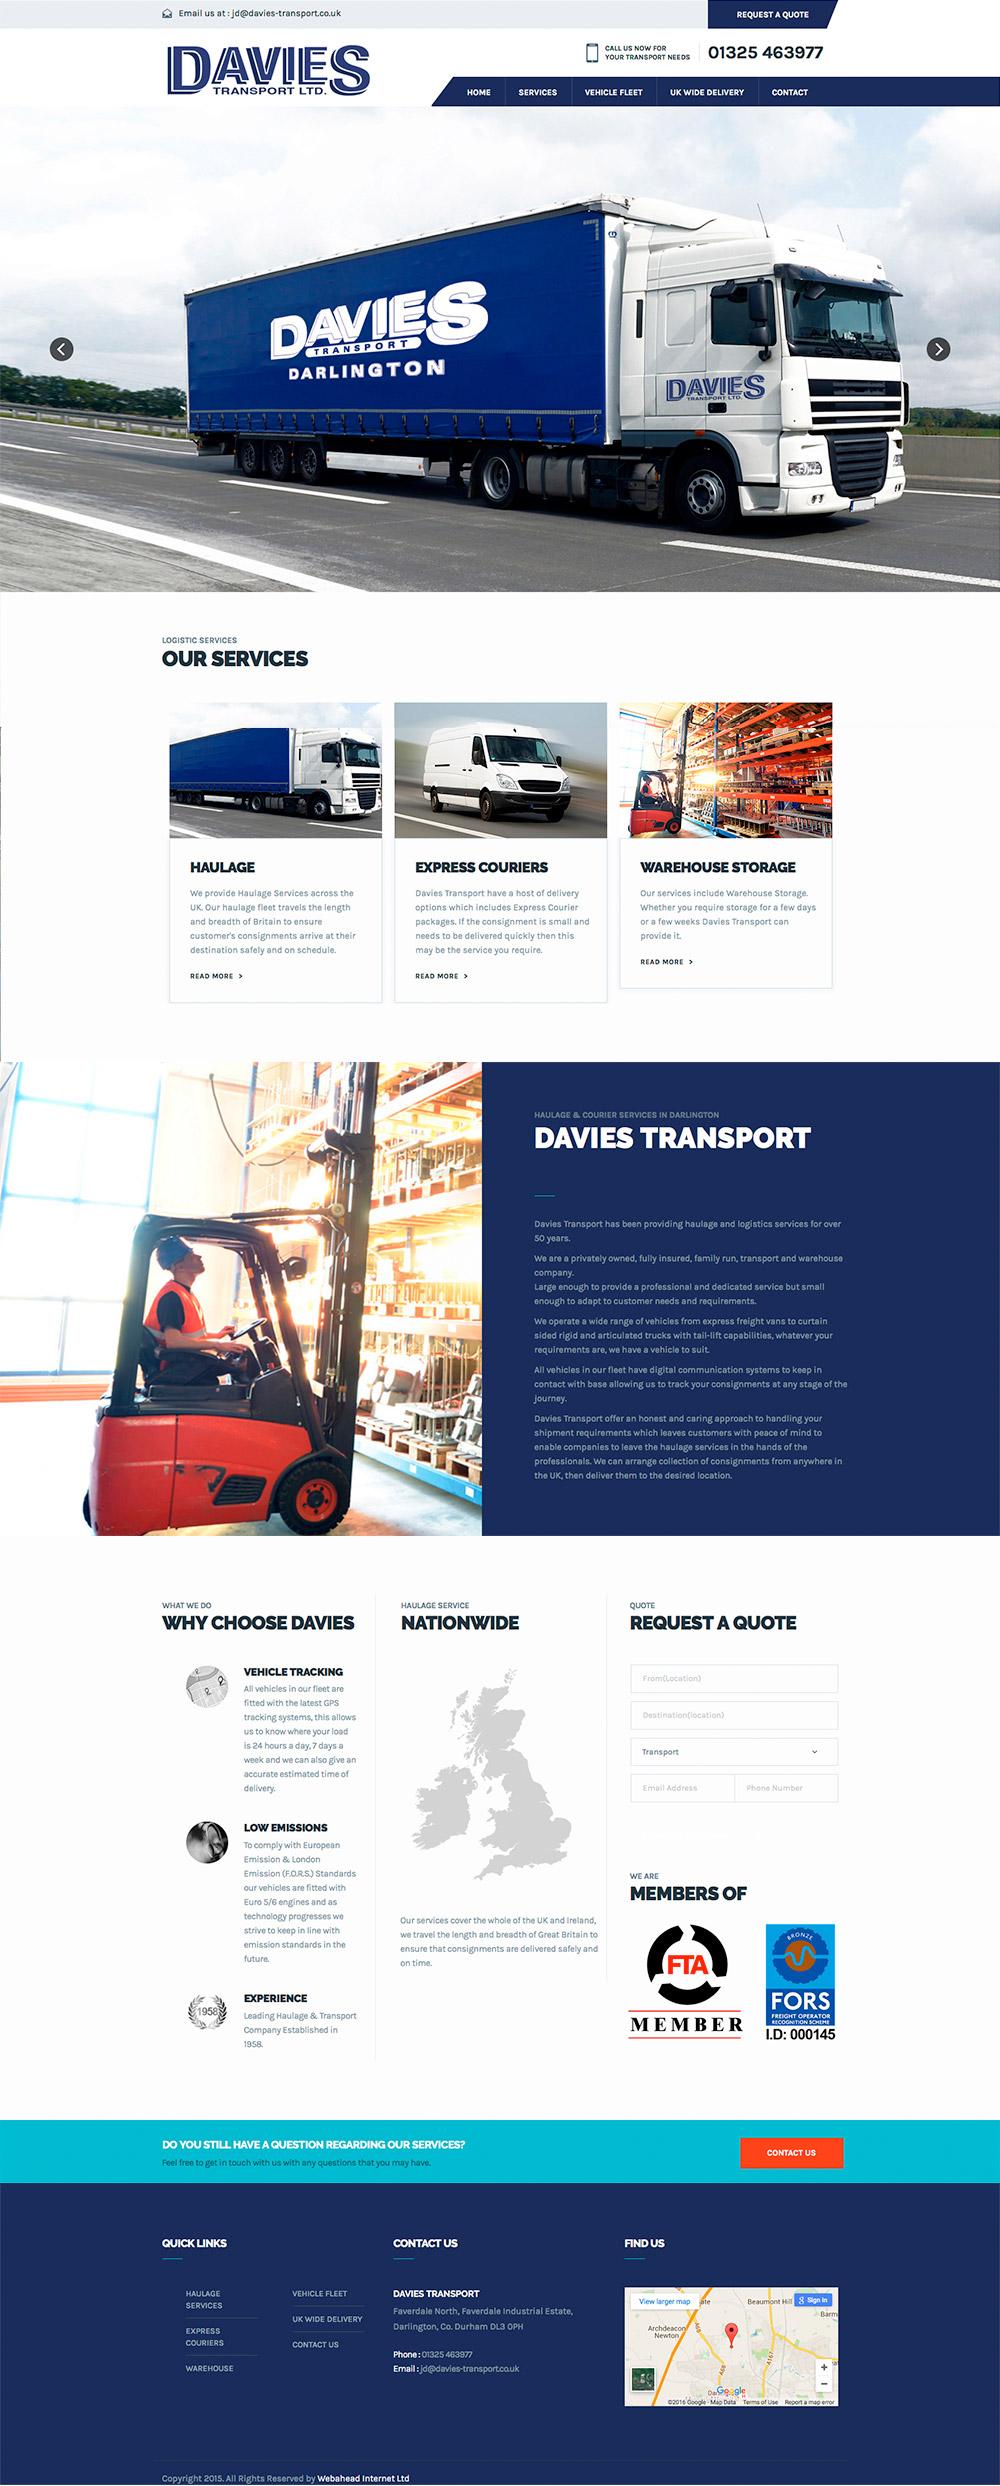 Davies Transport